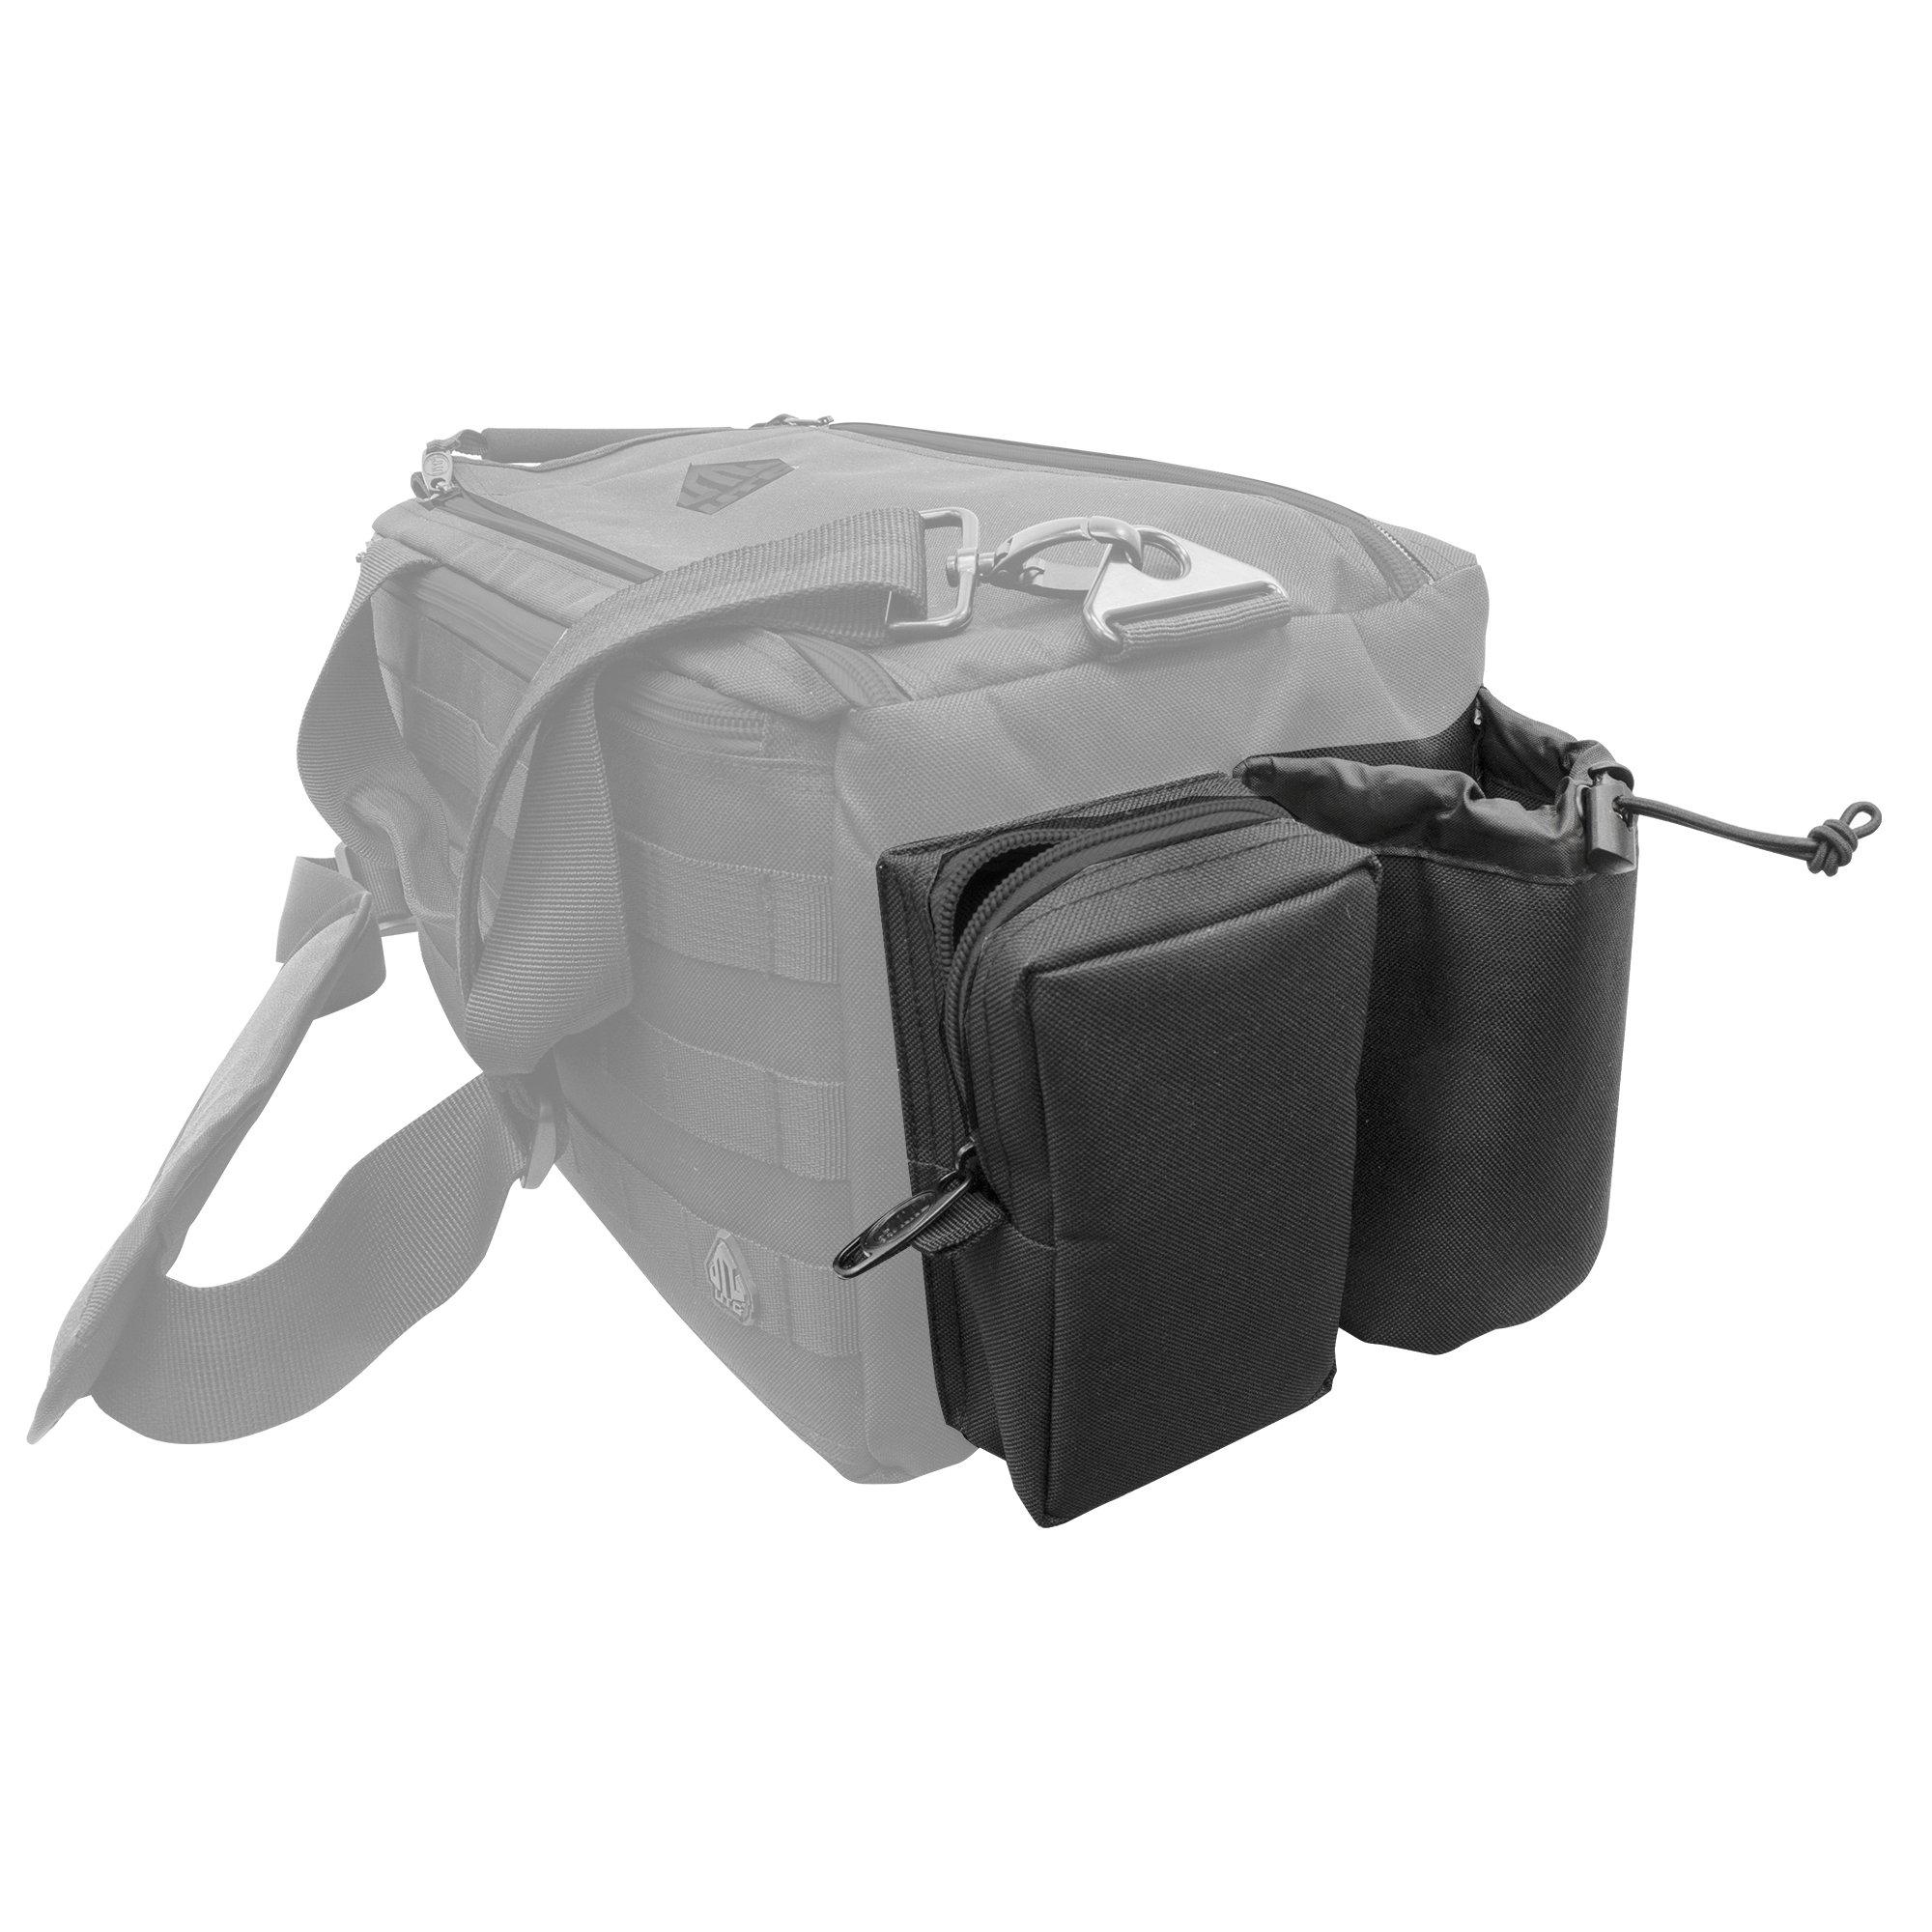 UTG All in One Range/Utility Go Bag, Black, 21'' x 10'' x 9'' by UTG (Image #5)